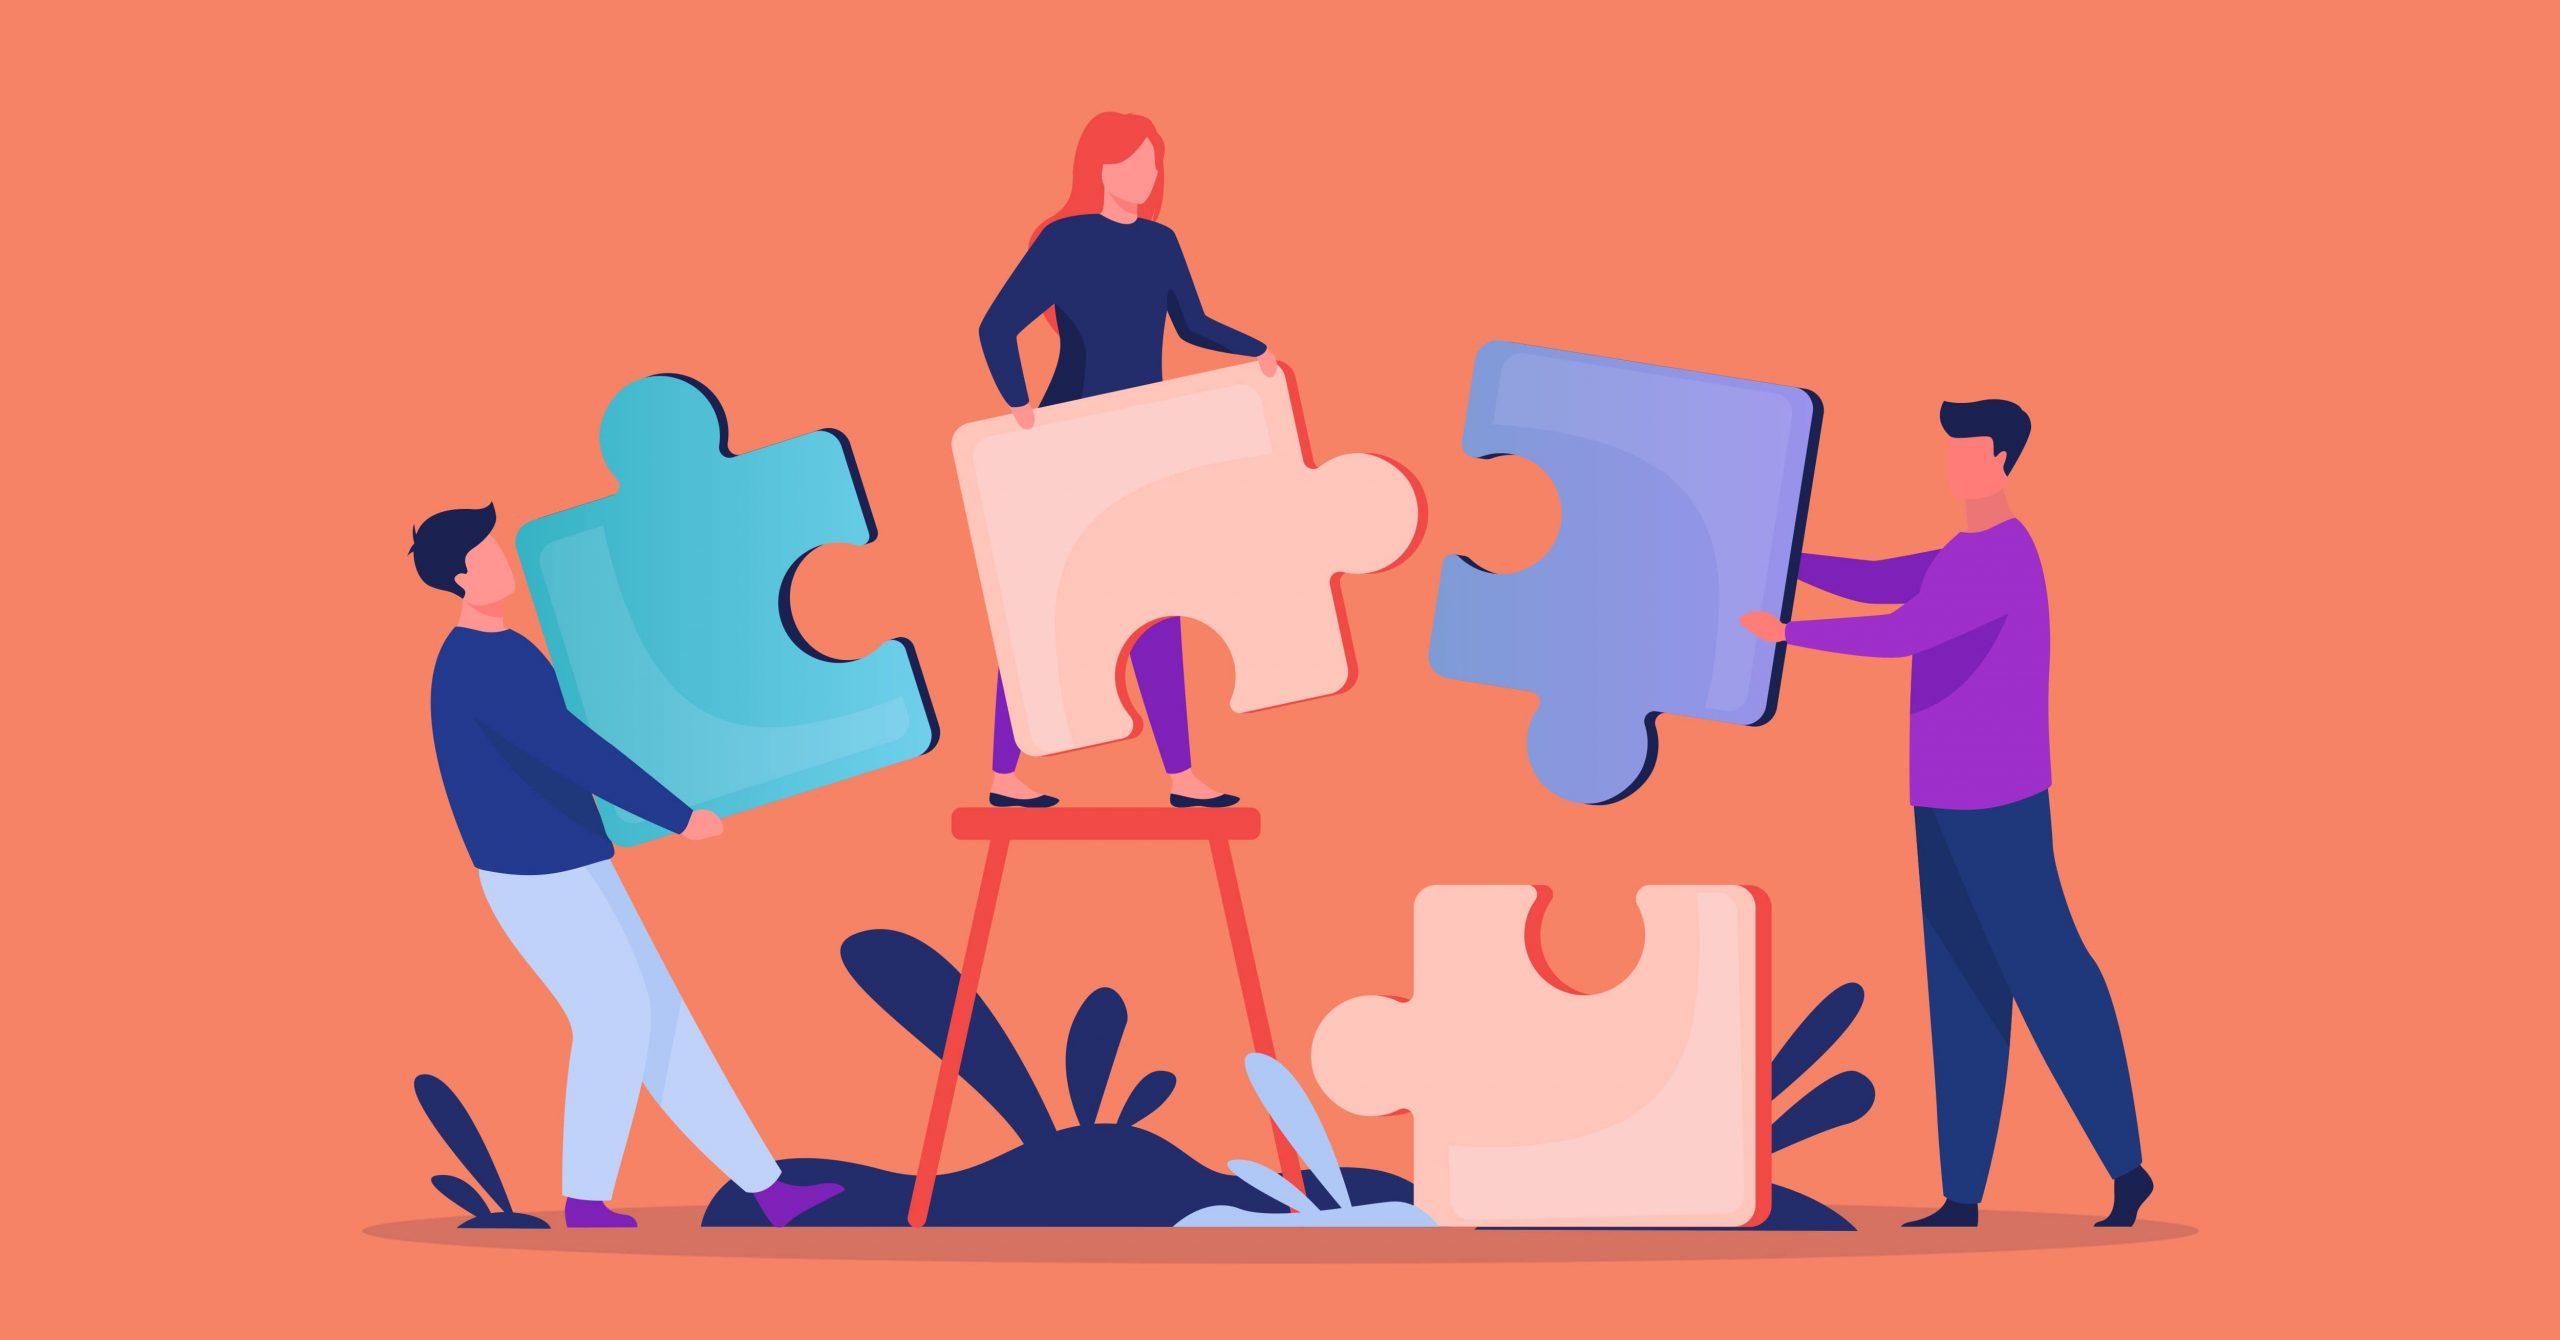 https://spotme.com/wp-content/uploads/2020/12/Hero-visual-Marketing-Team's-Guide-scaled.jpg